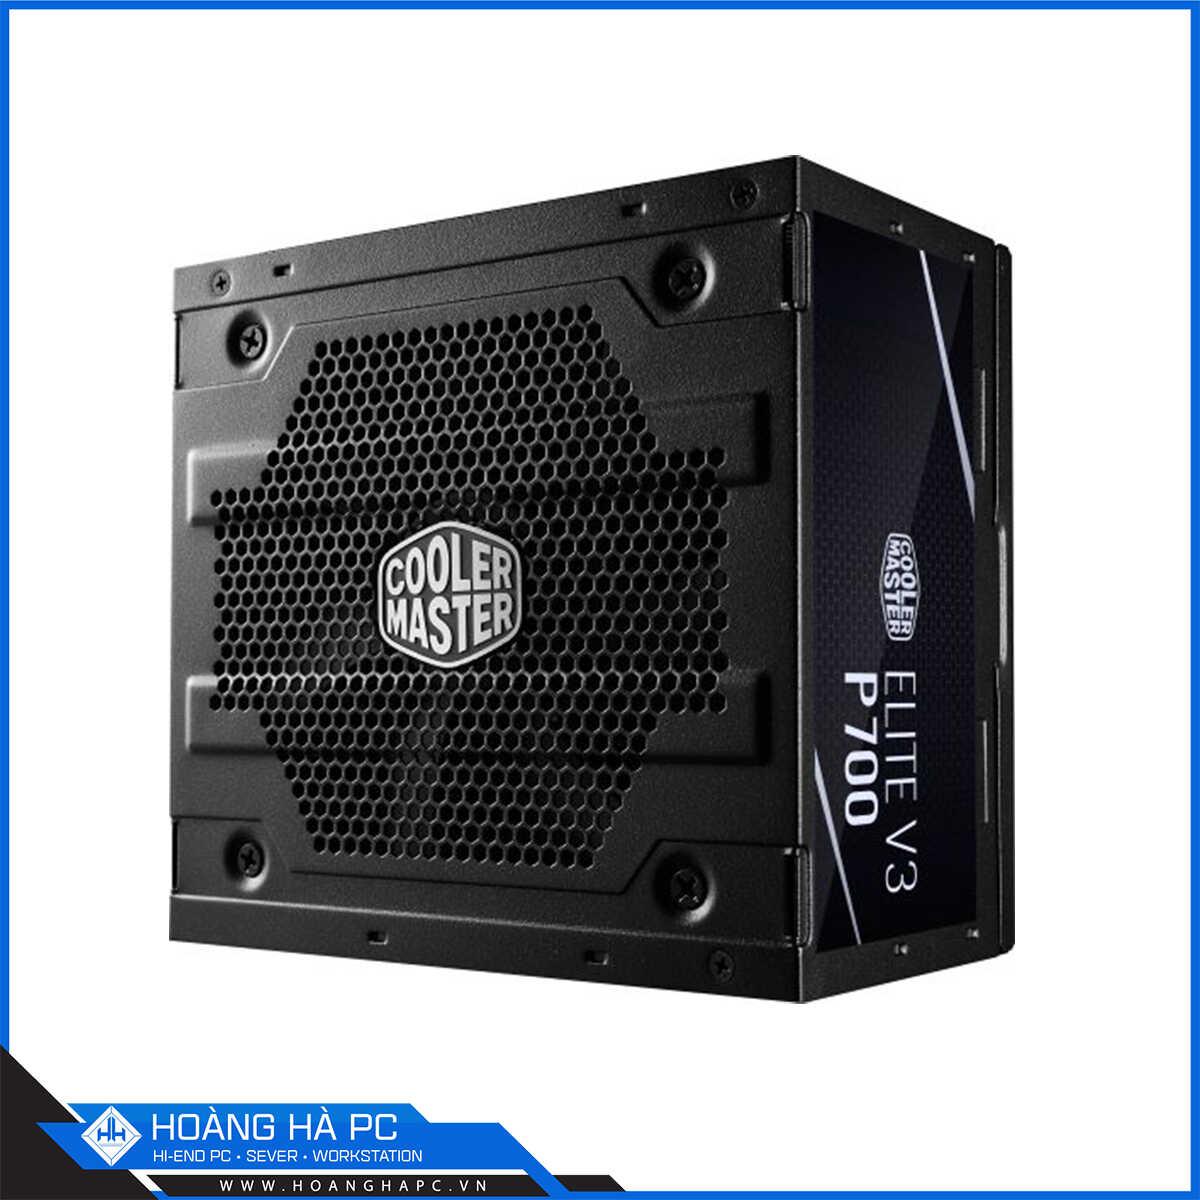 Nguồn Cooler Master Elite V3 PC700 700W